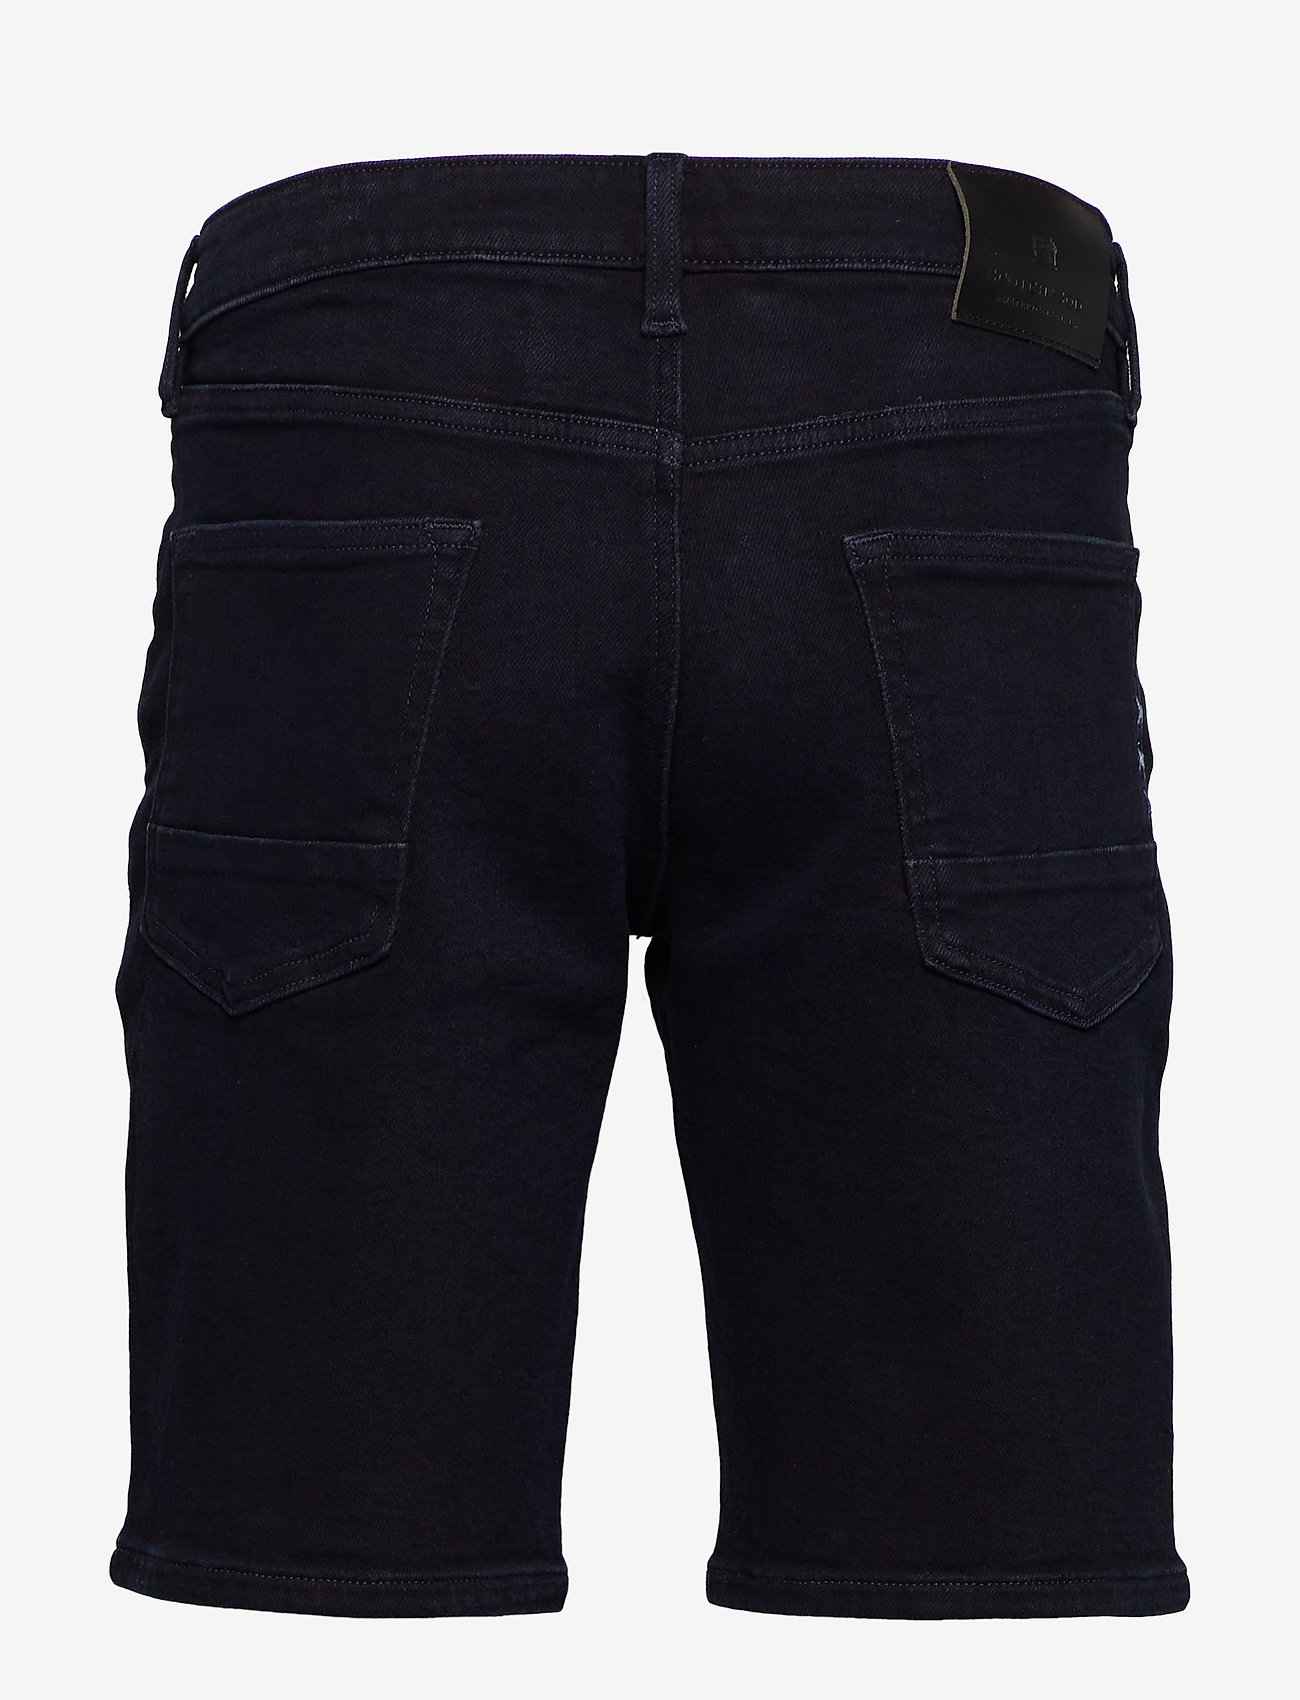 Scotch & Soda - Ralston Short - Autumn Mood - jeans shorts - autumn mood - 1